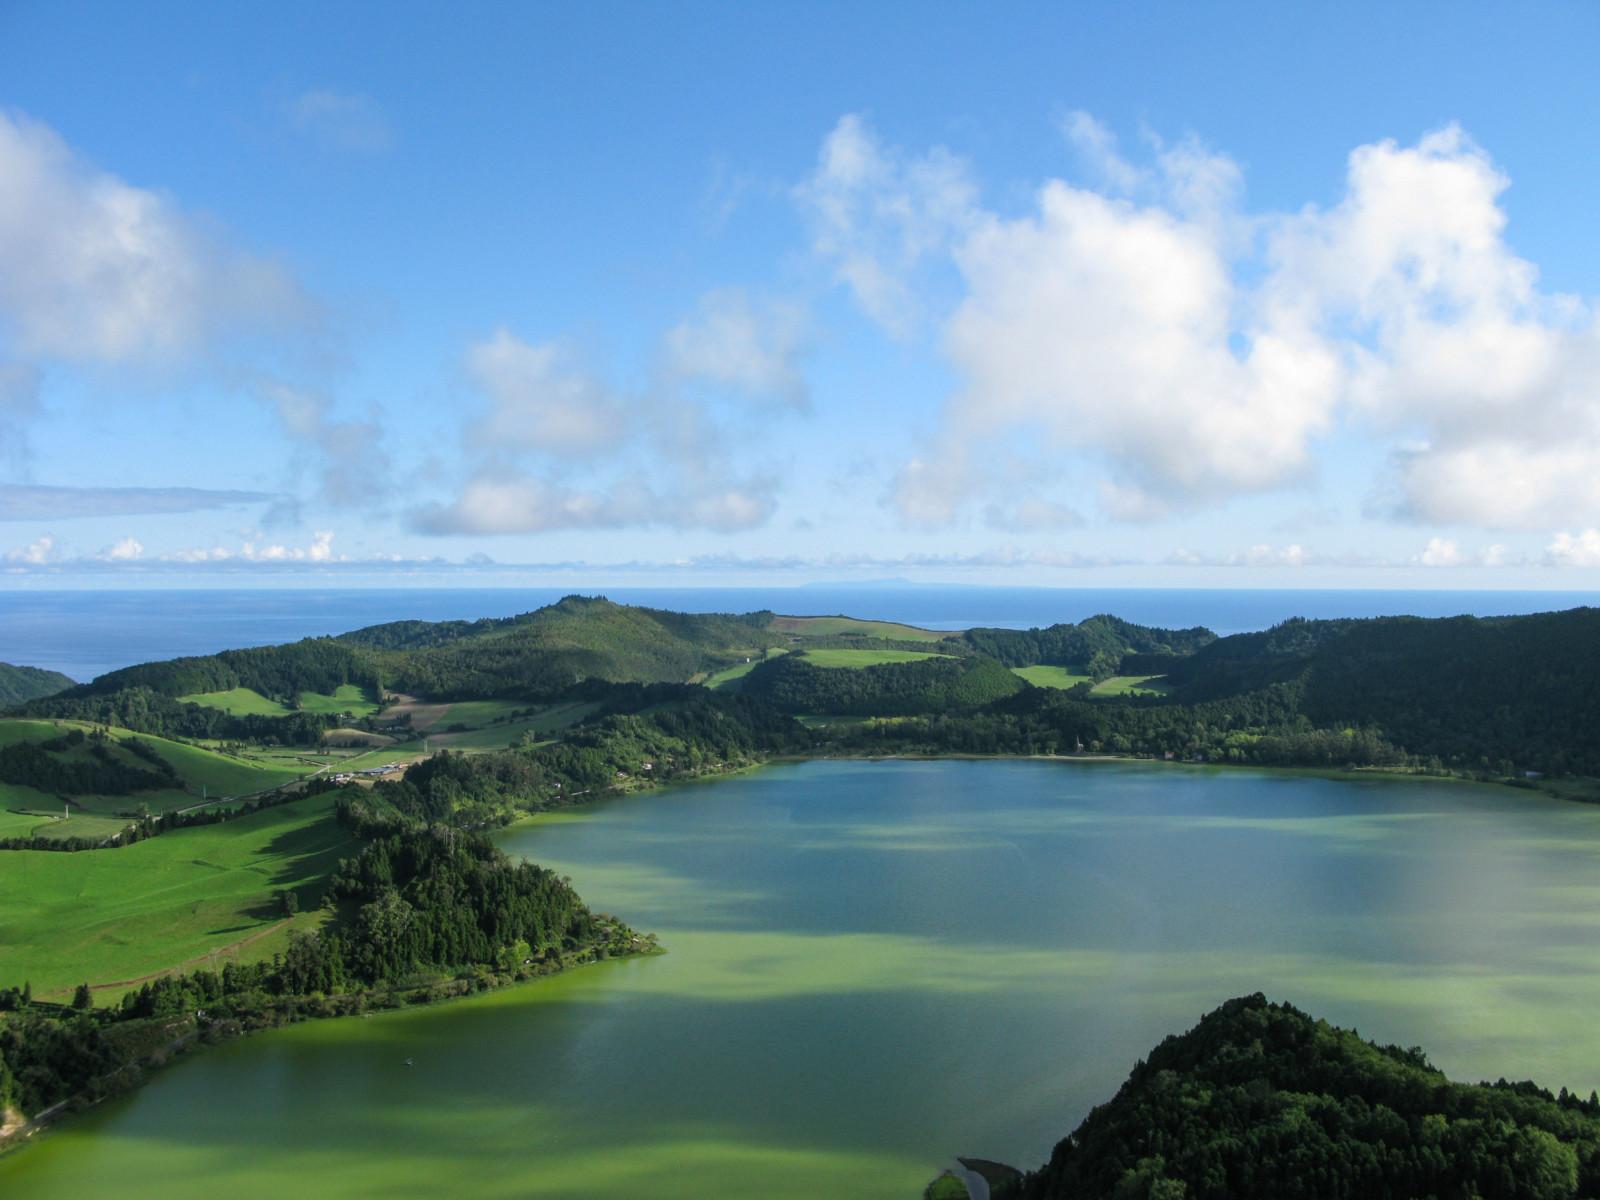 ENTFÄLLT Azoren - Paradies im Atlantik 2021 - Union Reiseteam